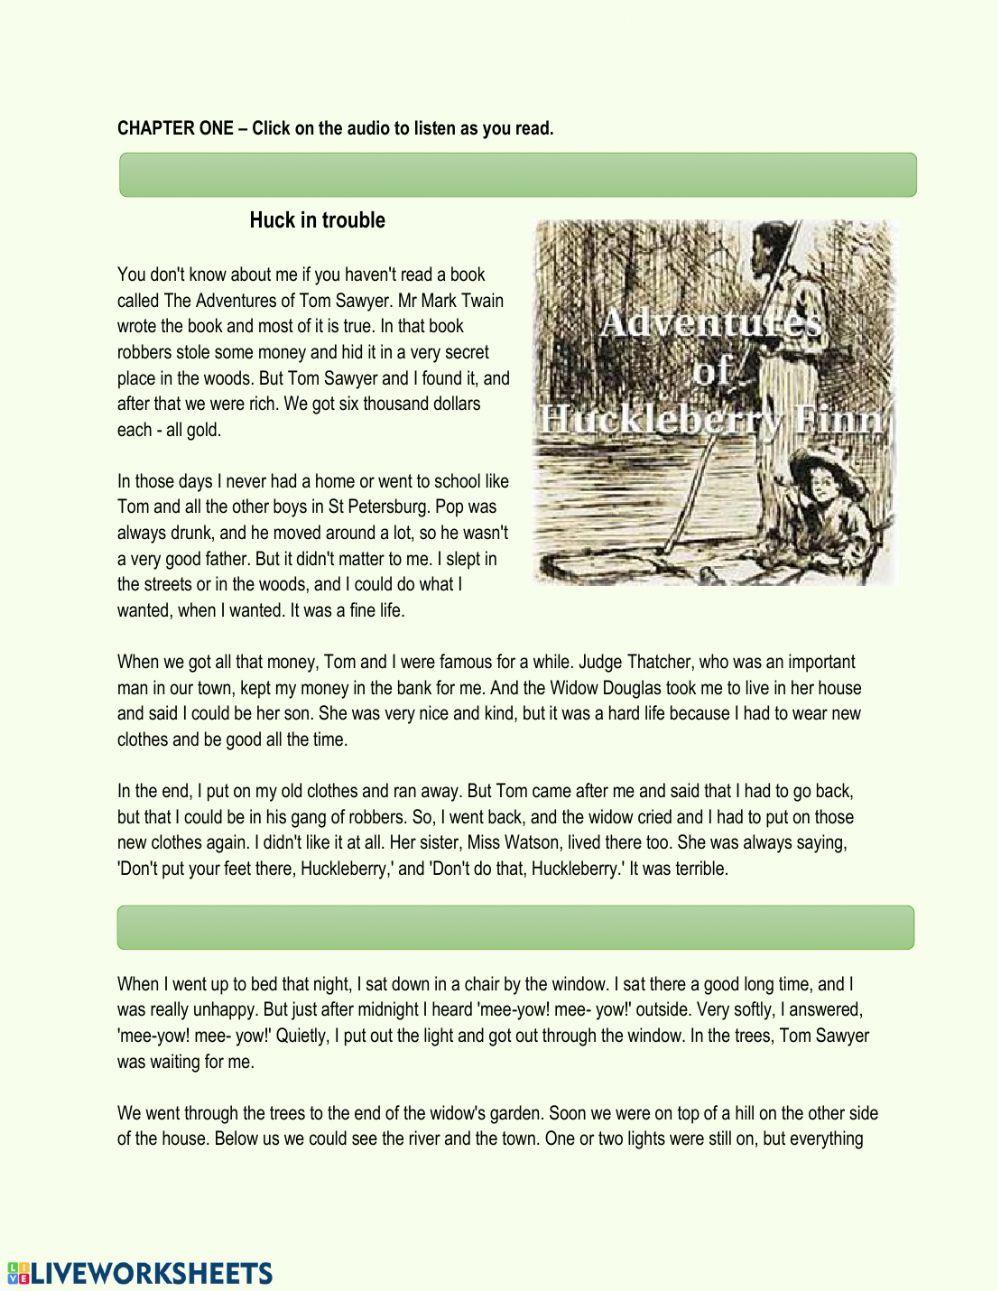 The Adventures Of Huckleberry Finn Chapter 1 Interactive Worksheet Adventures Of Huckleberry Finn Huckleberry Finn Huckleberry [ 1291 x 1000 Pixel ]